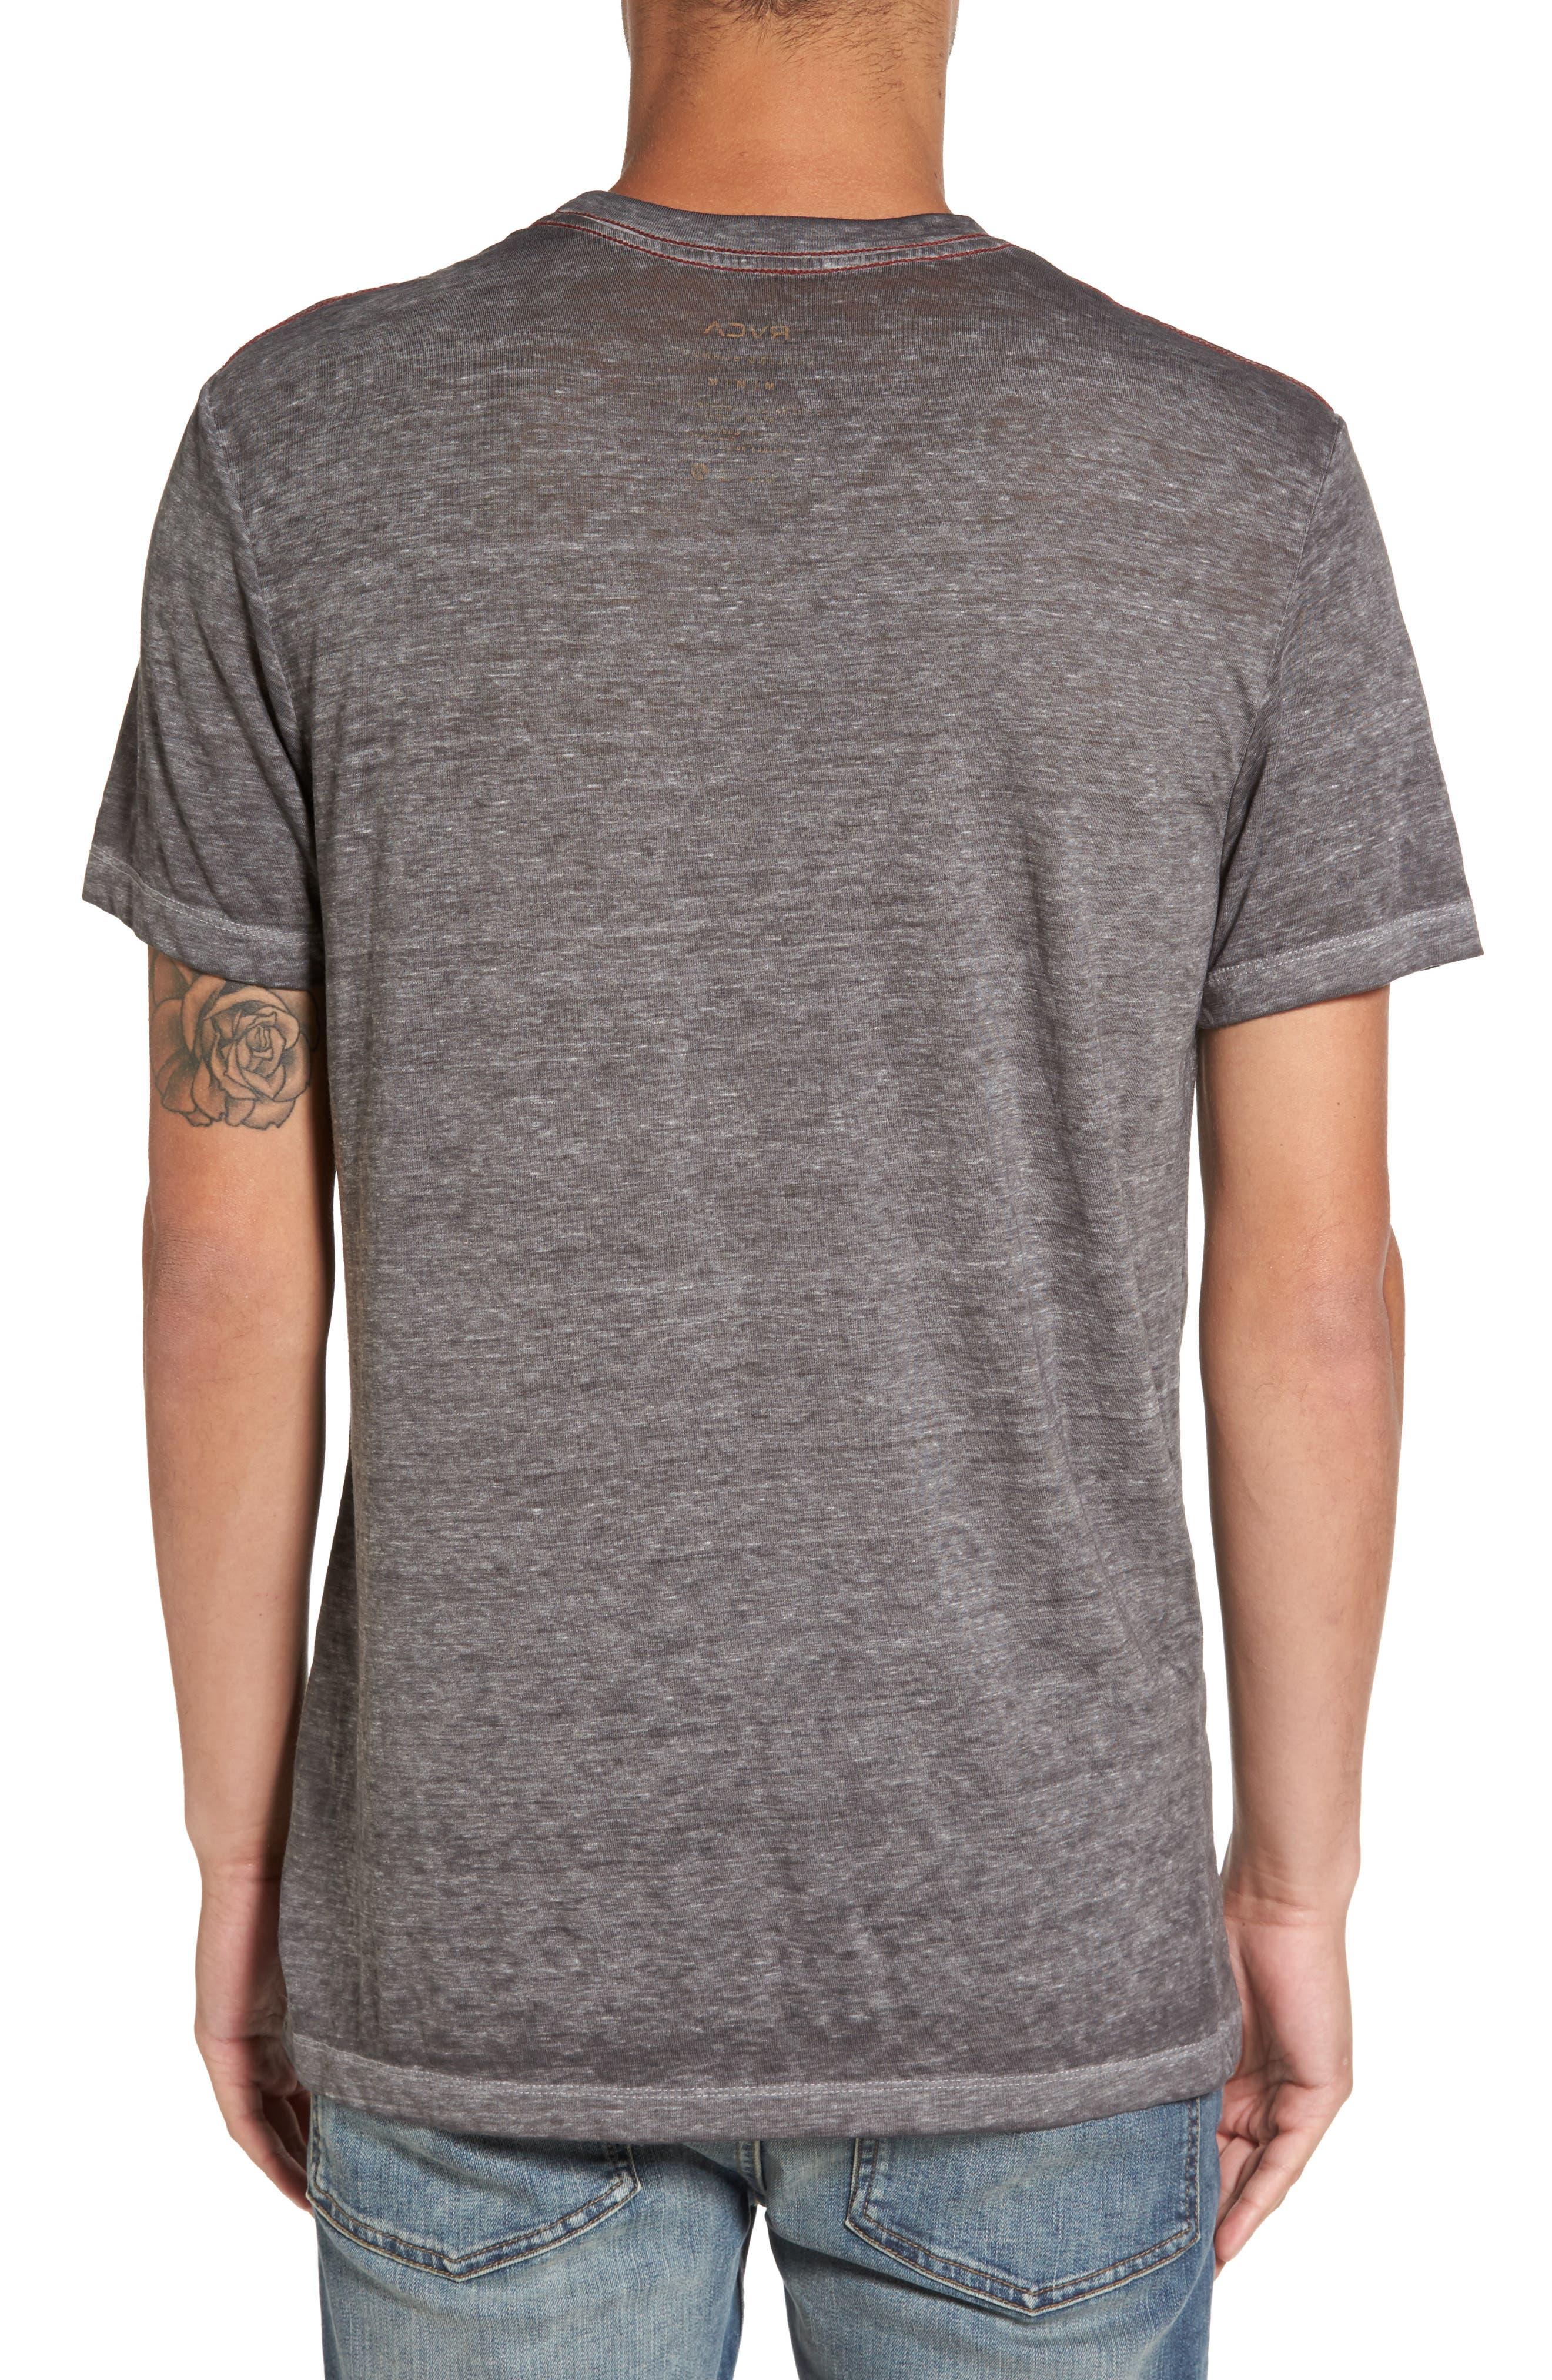 Balance Process T-Shirt,                             Alternate thumbnail 2, color,                             051